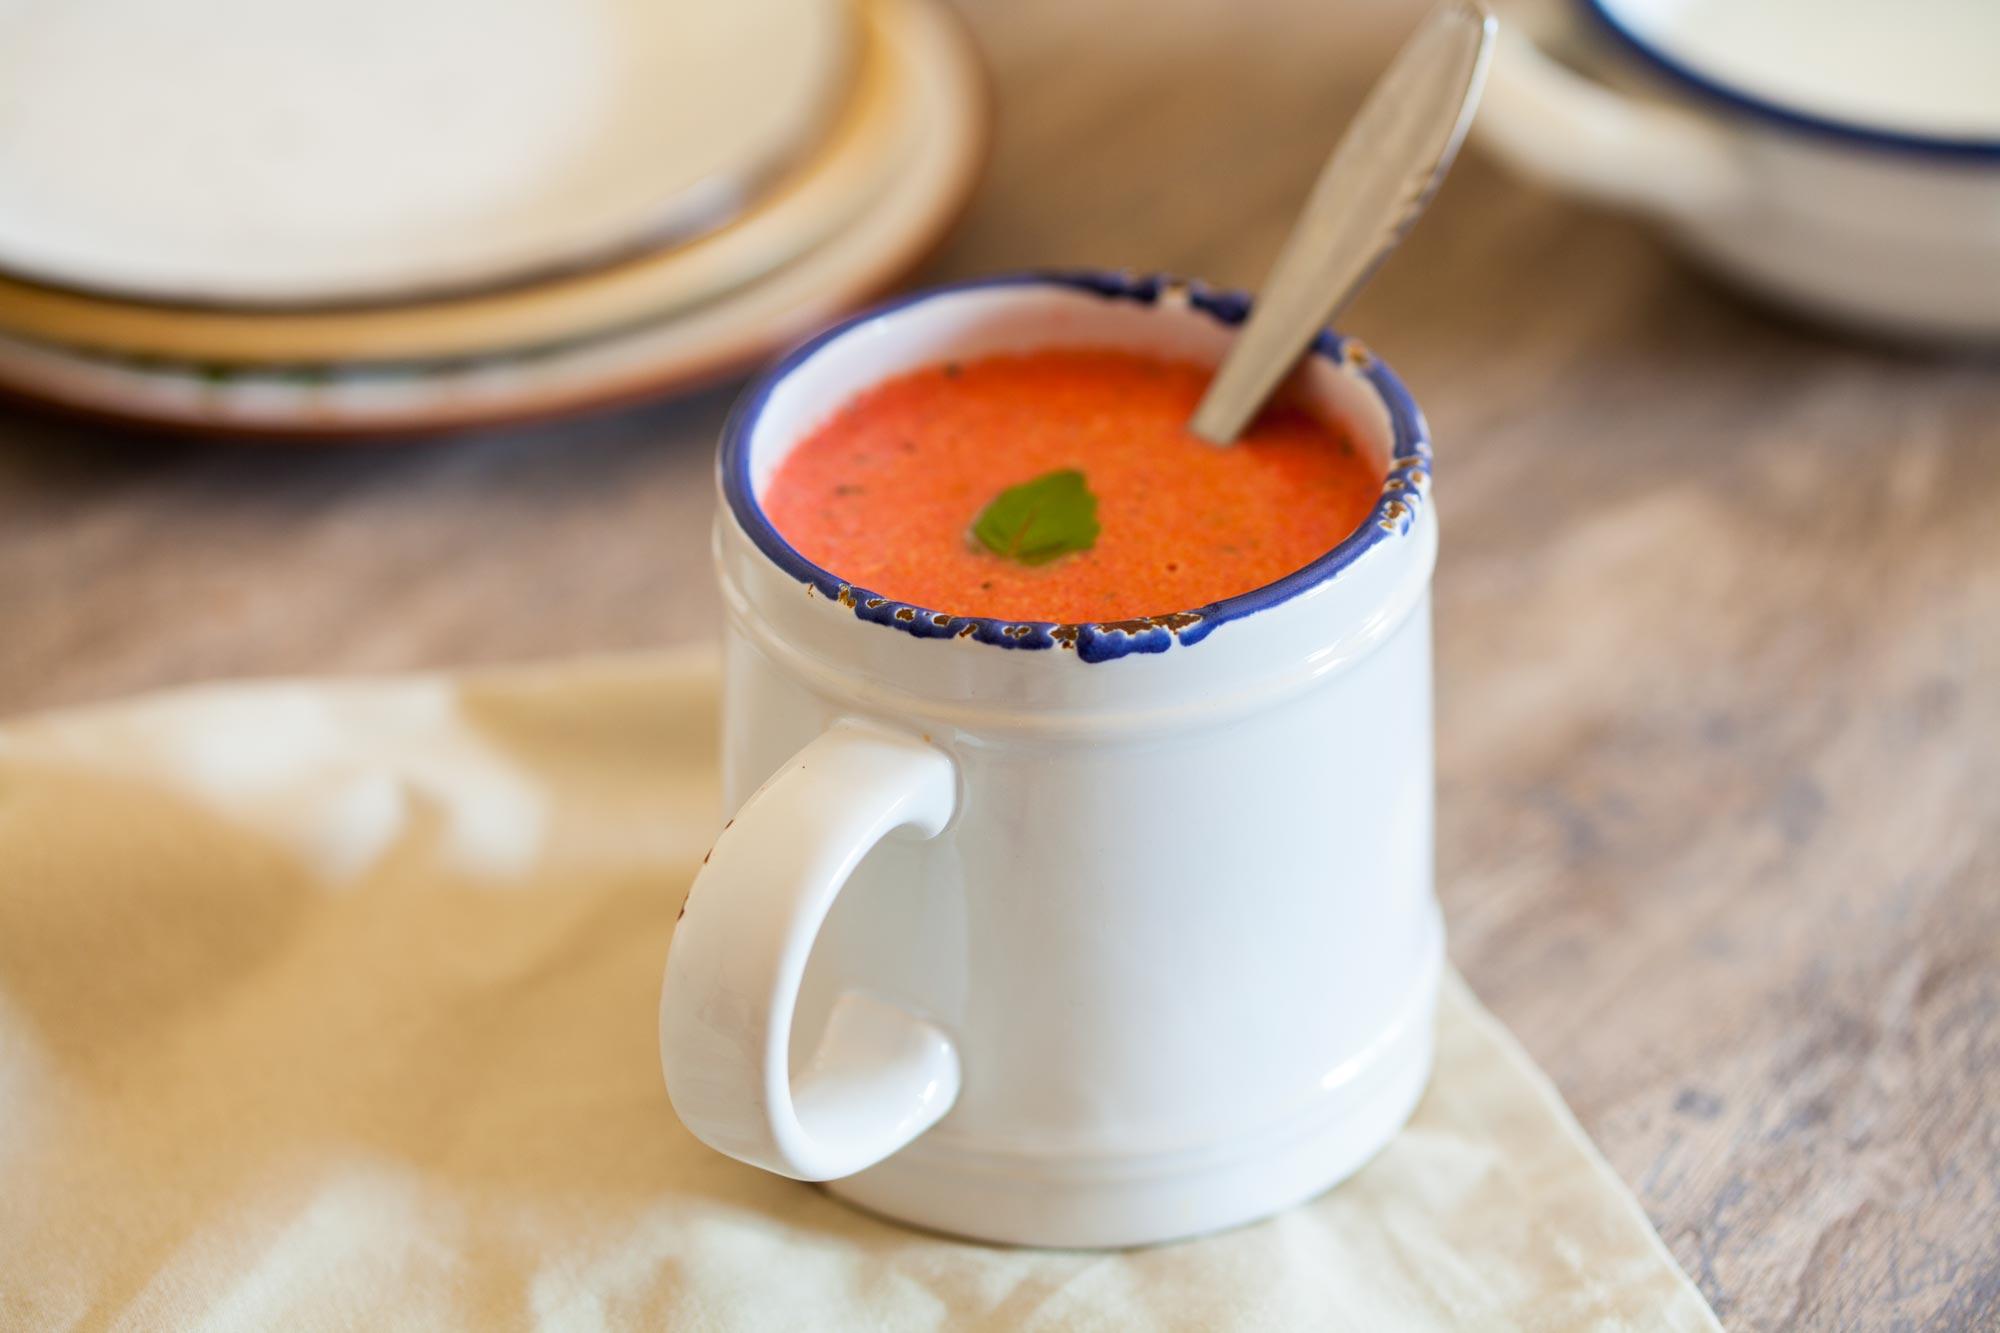 Kremna pesina juha s korenčkom in timijanom